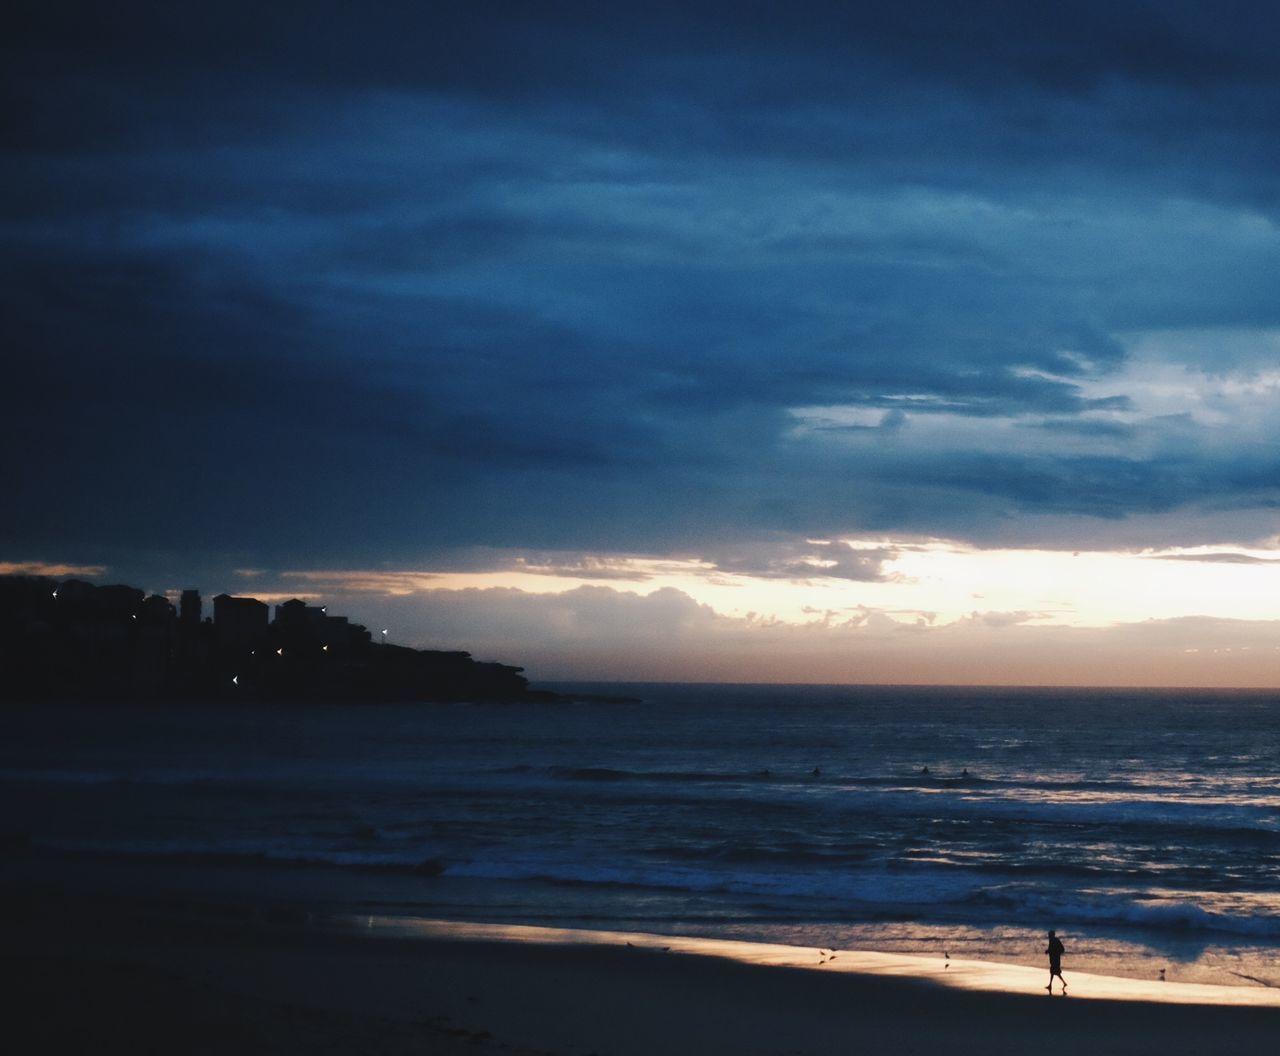 Storm Thunderstorm Beach